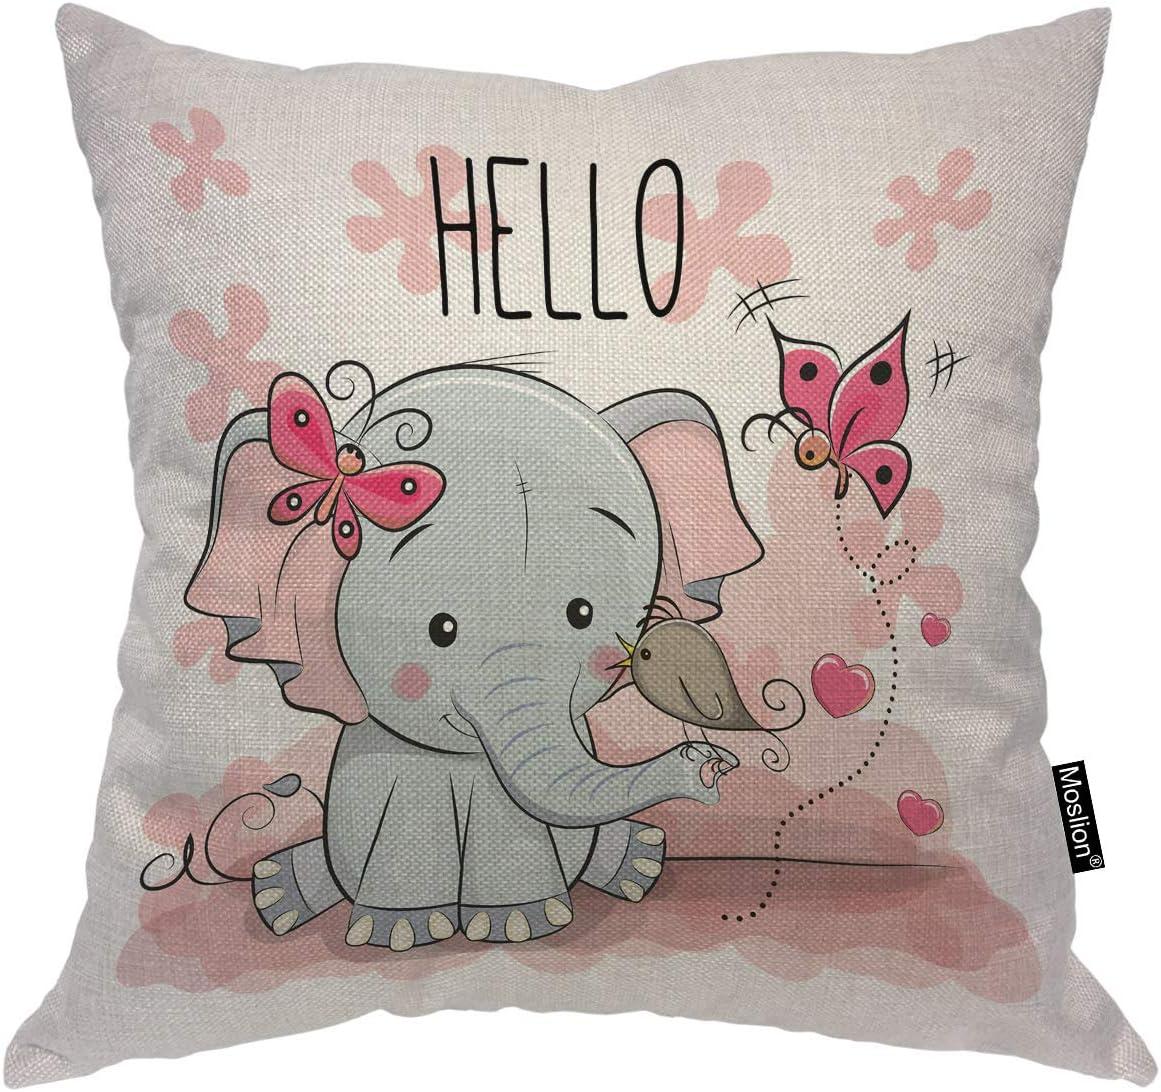 Moslion Elephant Pillow Cartoon